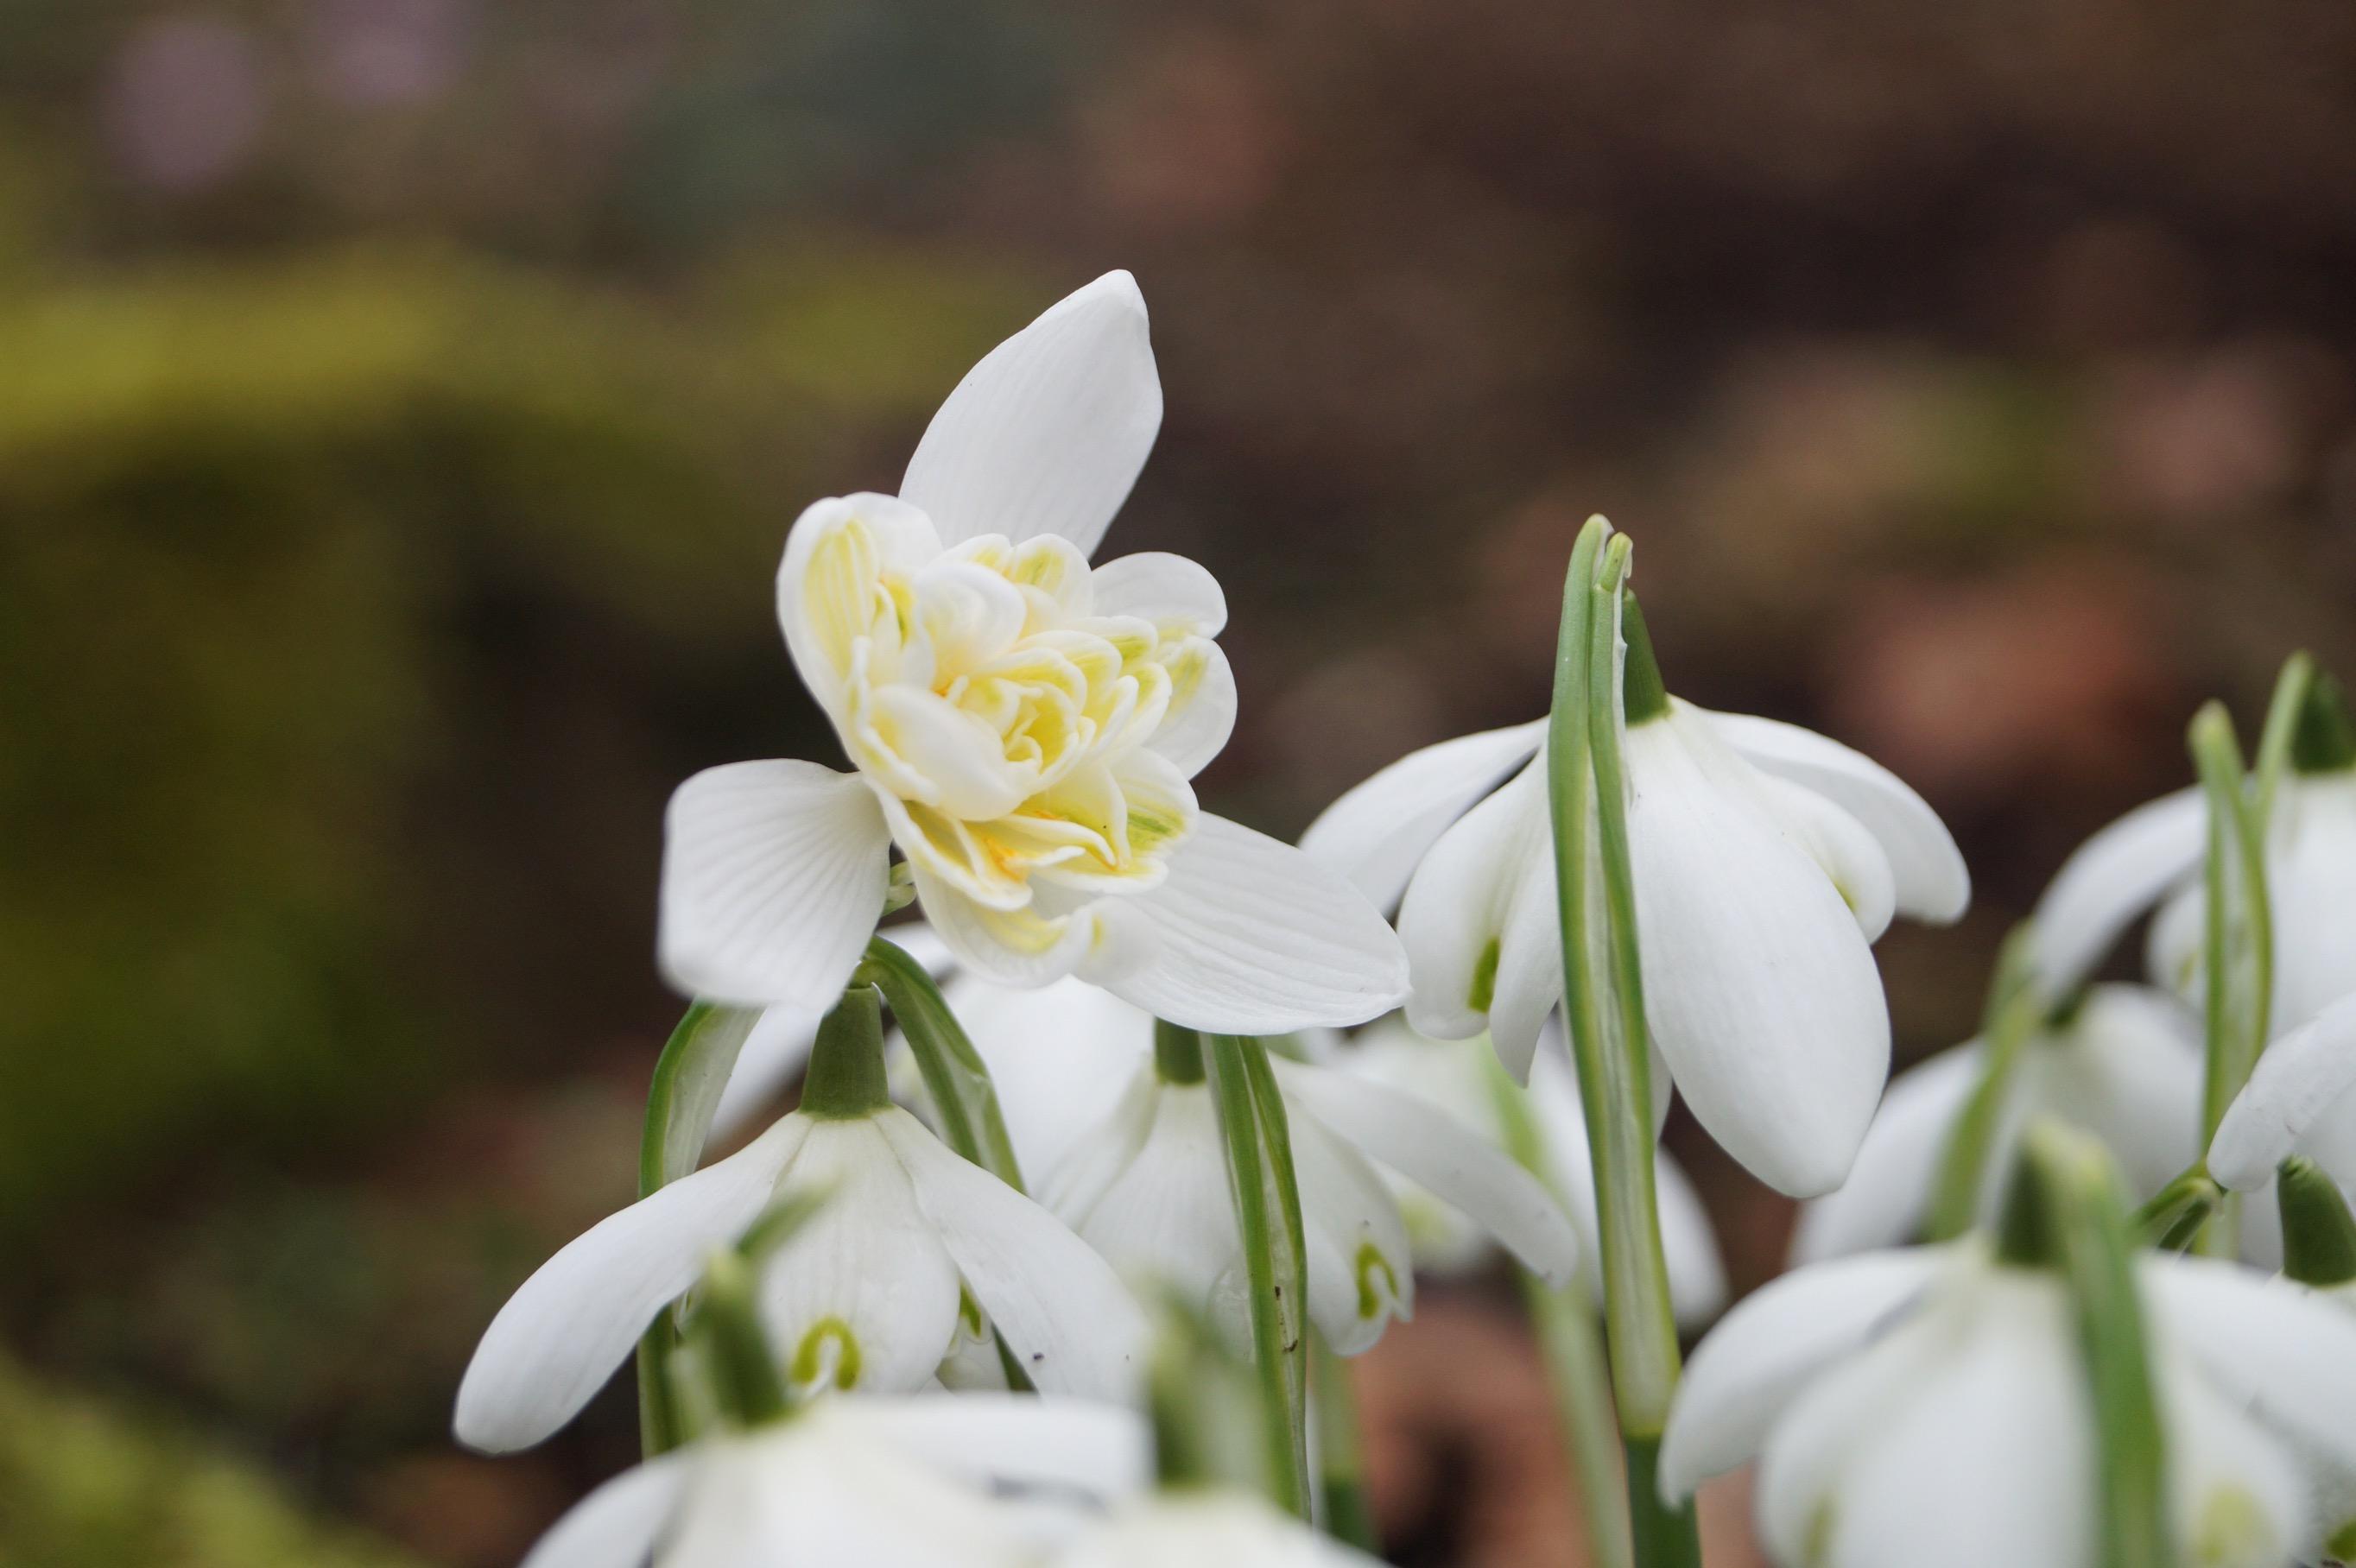 galanthus_nivalis_lady_elphinstone_morlas_plants